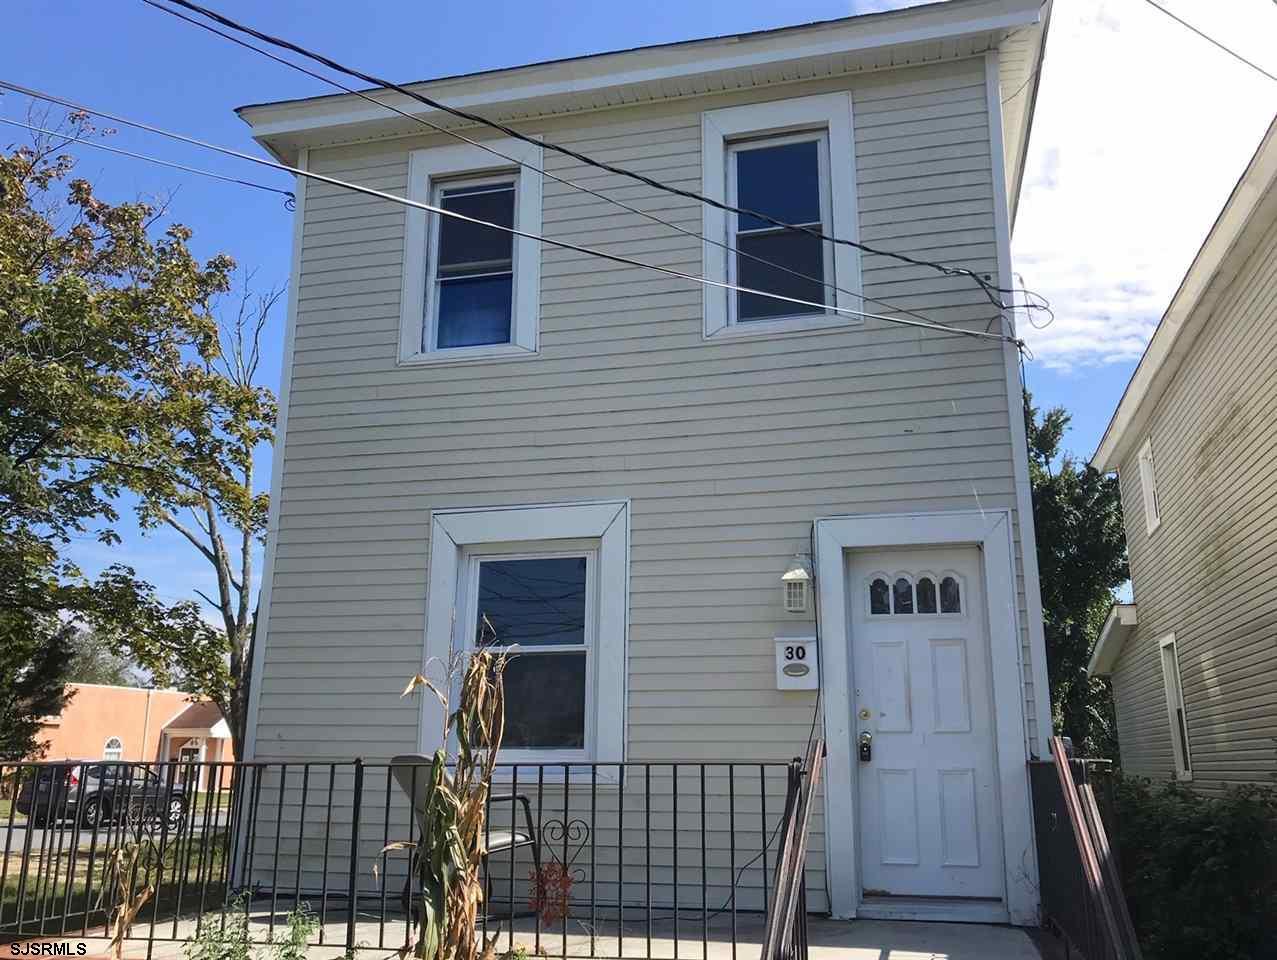 30 N 4th St, Pleasantville, NJ, 08232